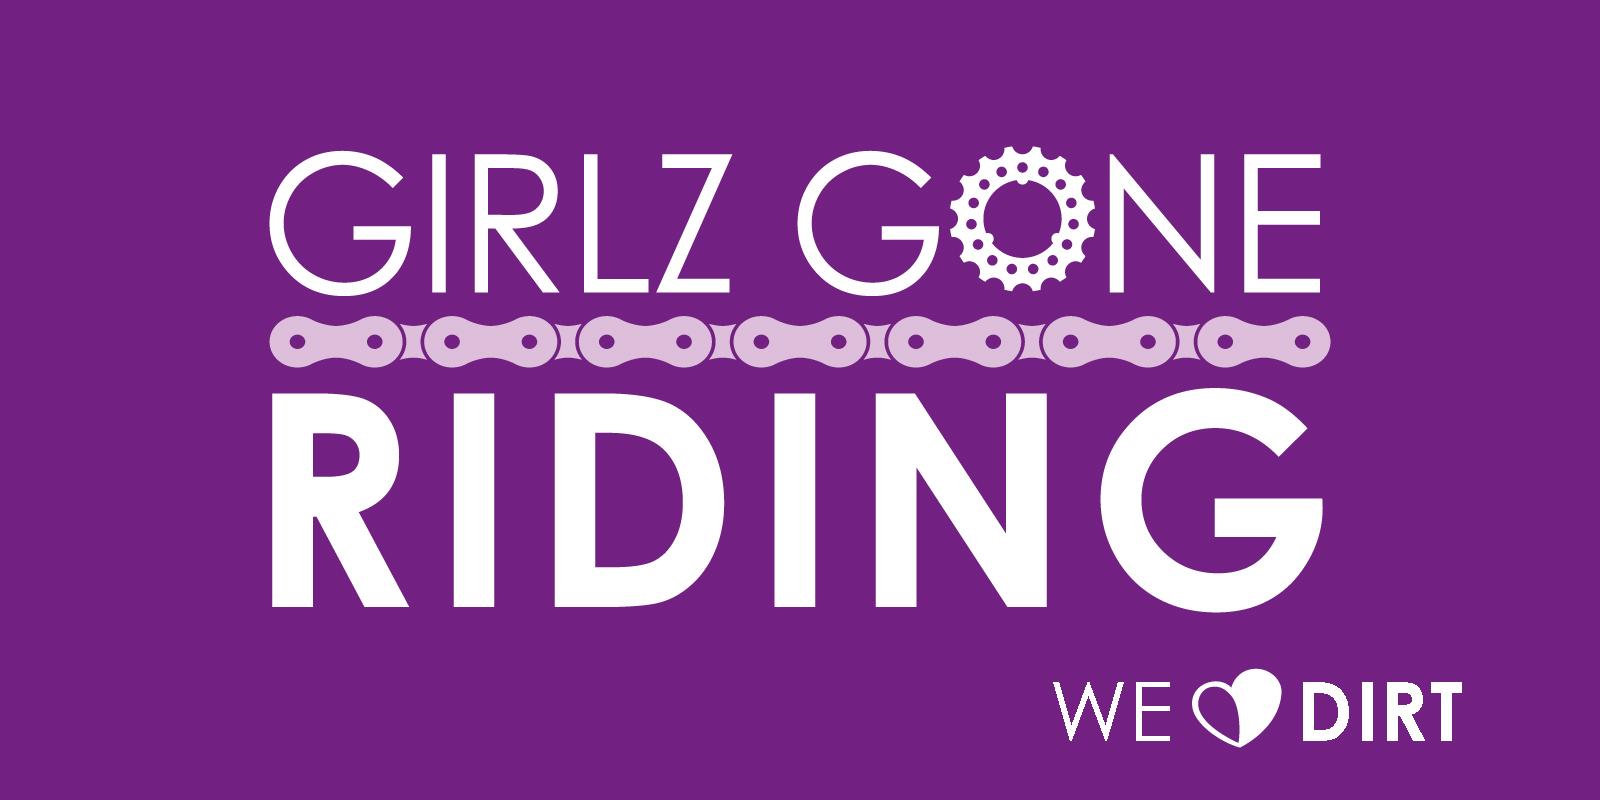 Girlz Gone Riding